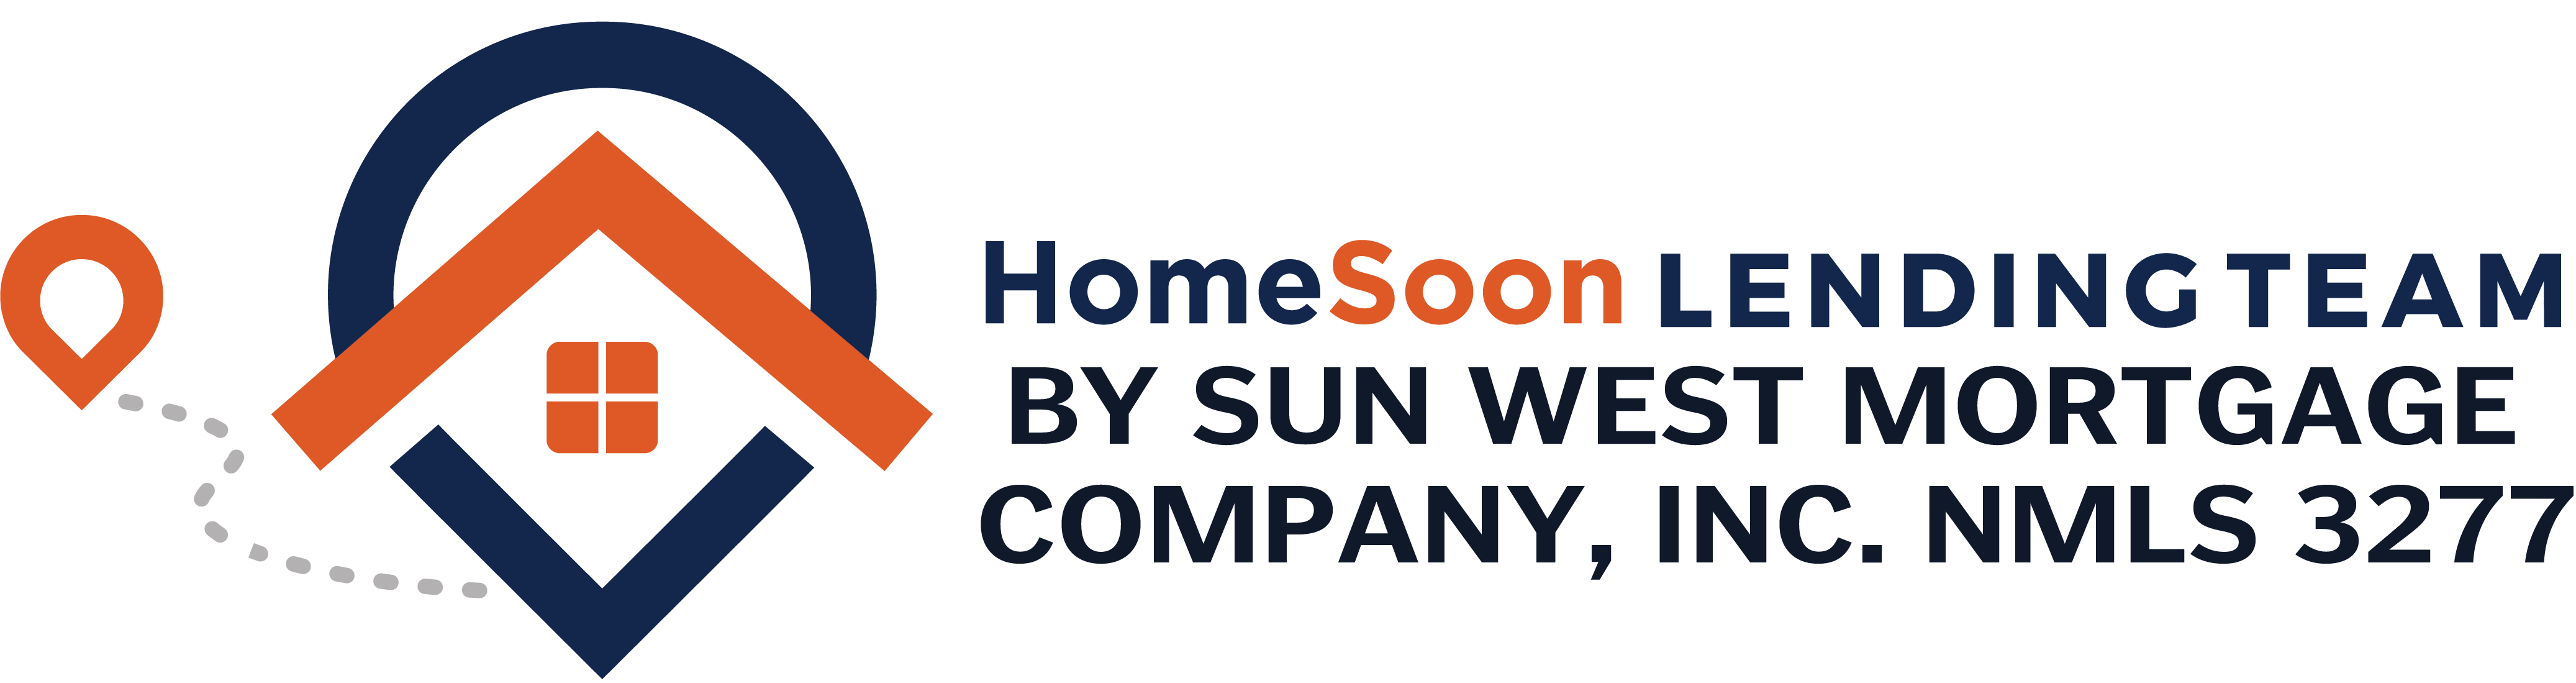 HomeSoon